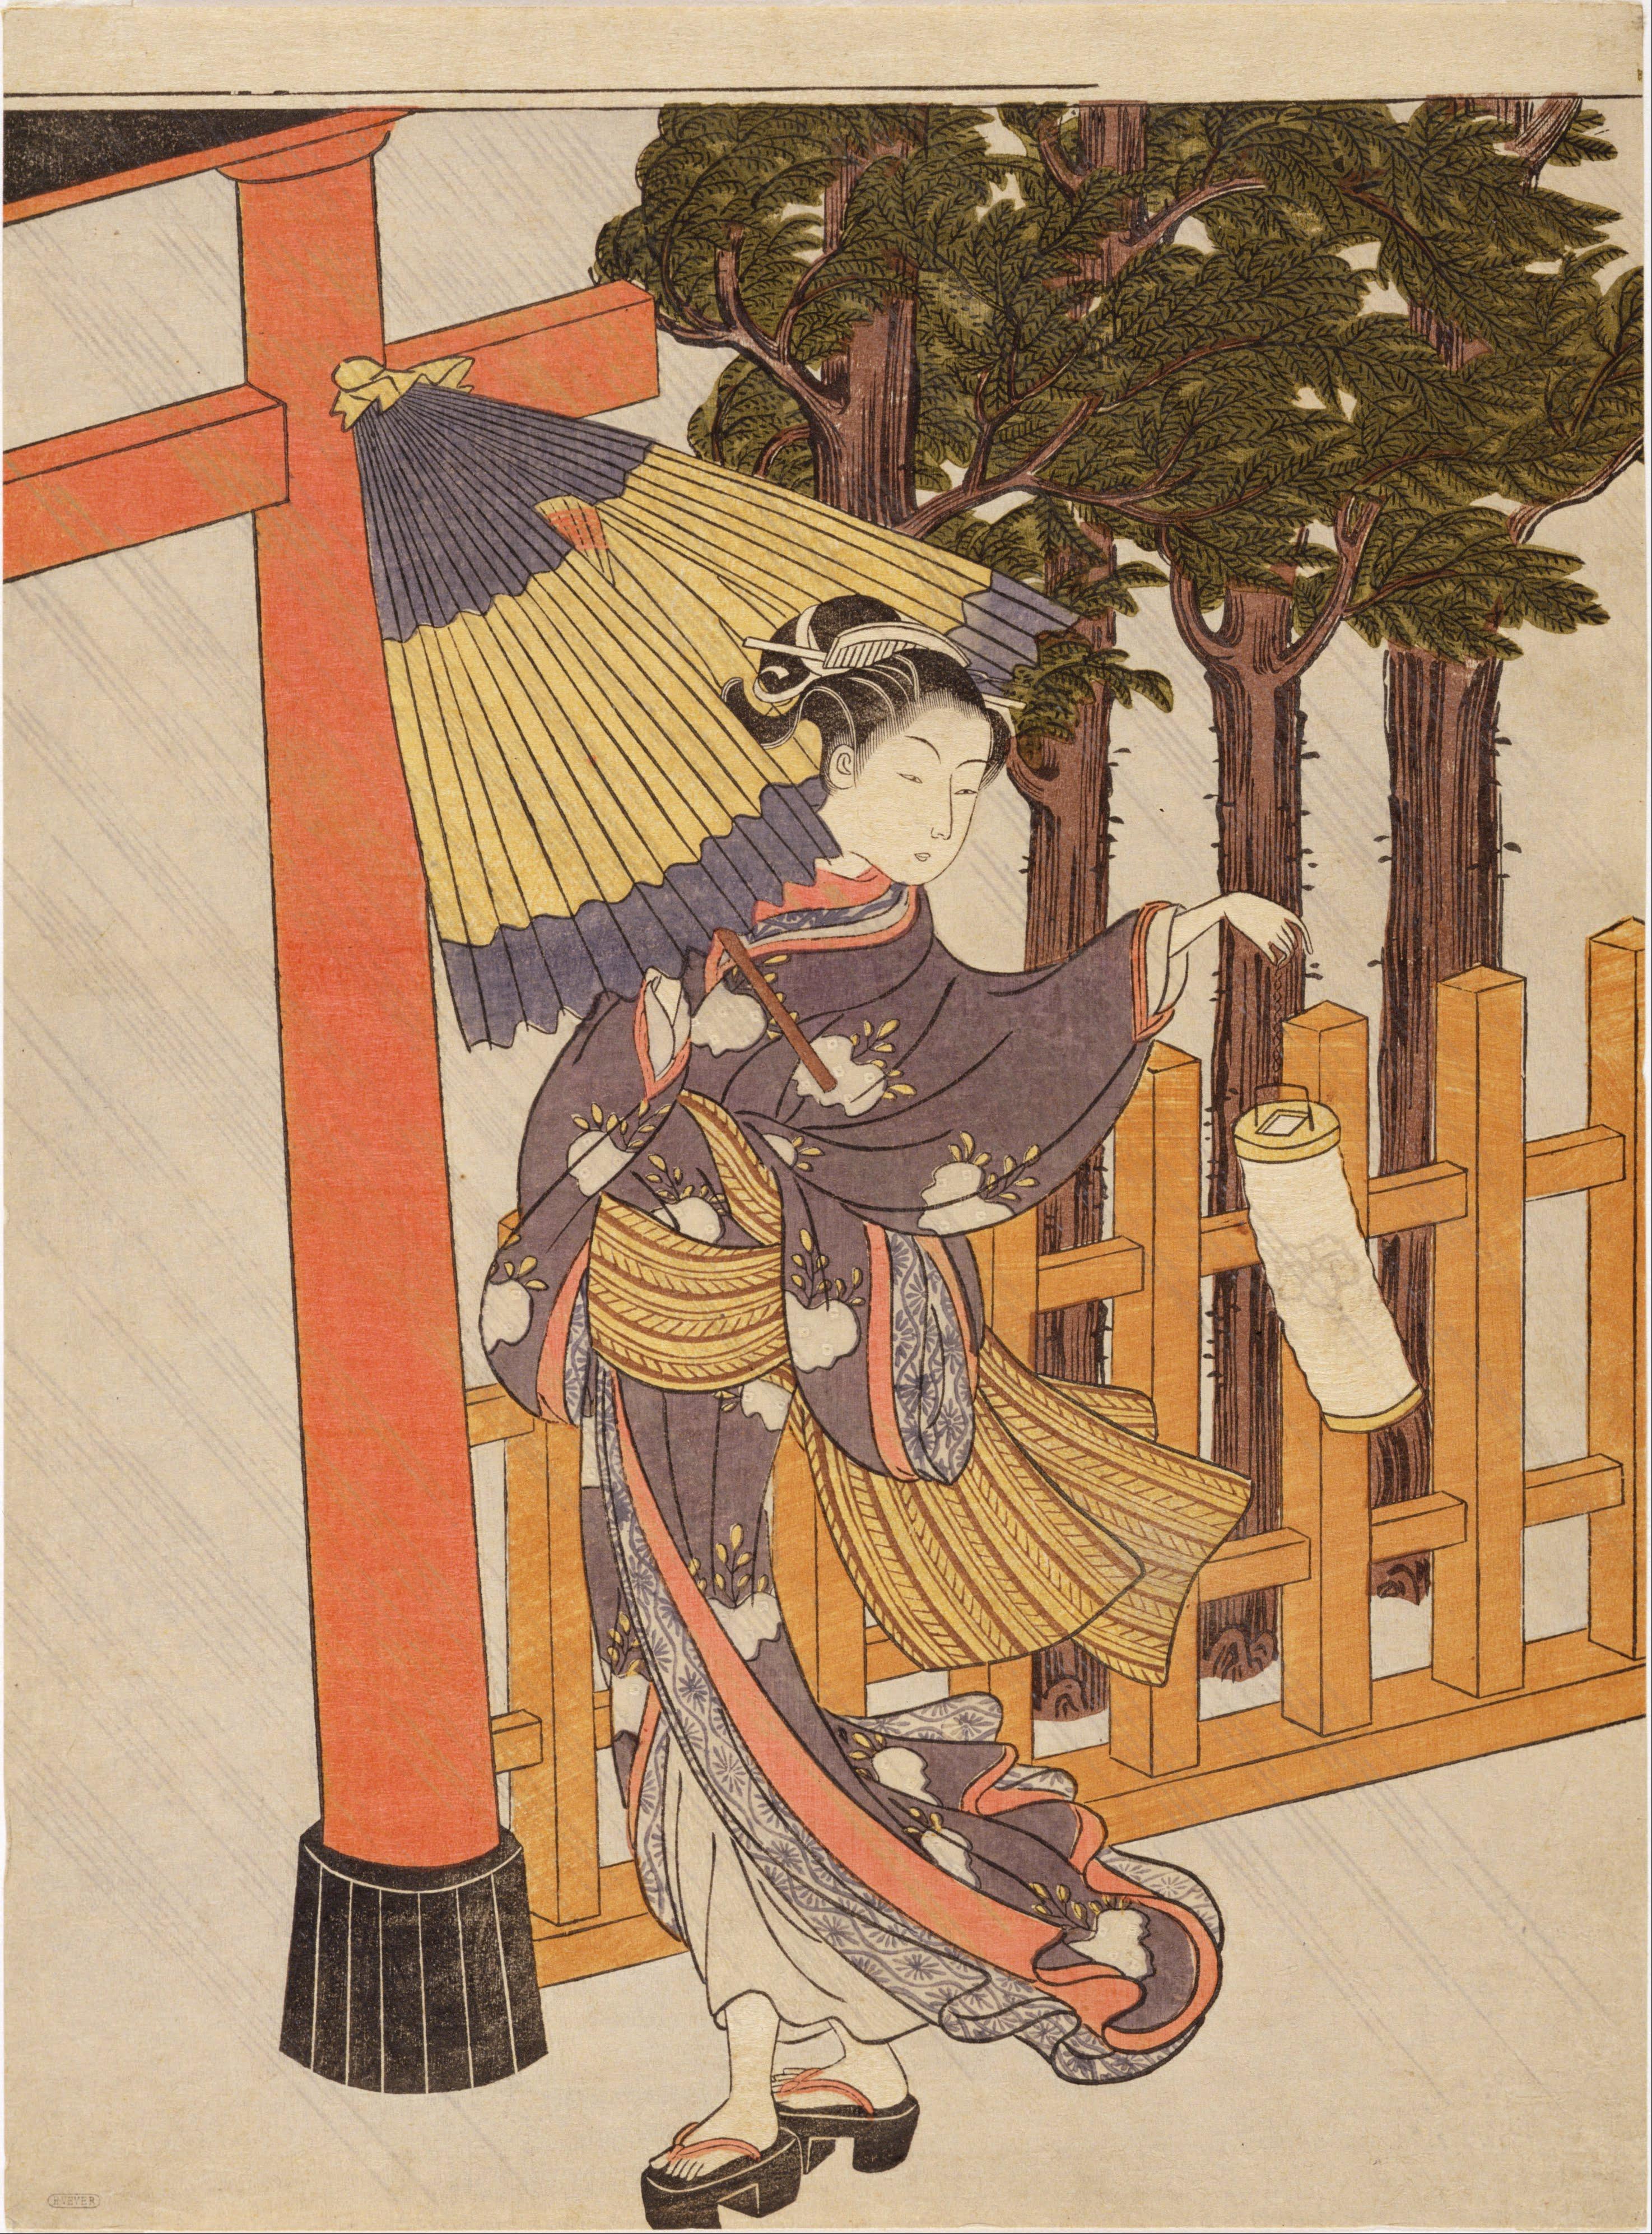 Suzuki Harunobu httpsuploadwikimediaorgwikipediacommons00